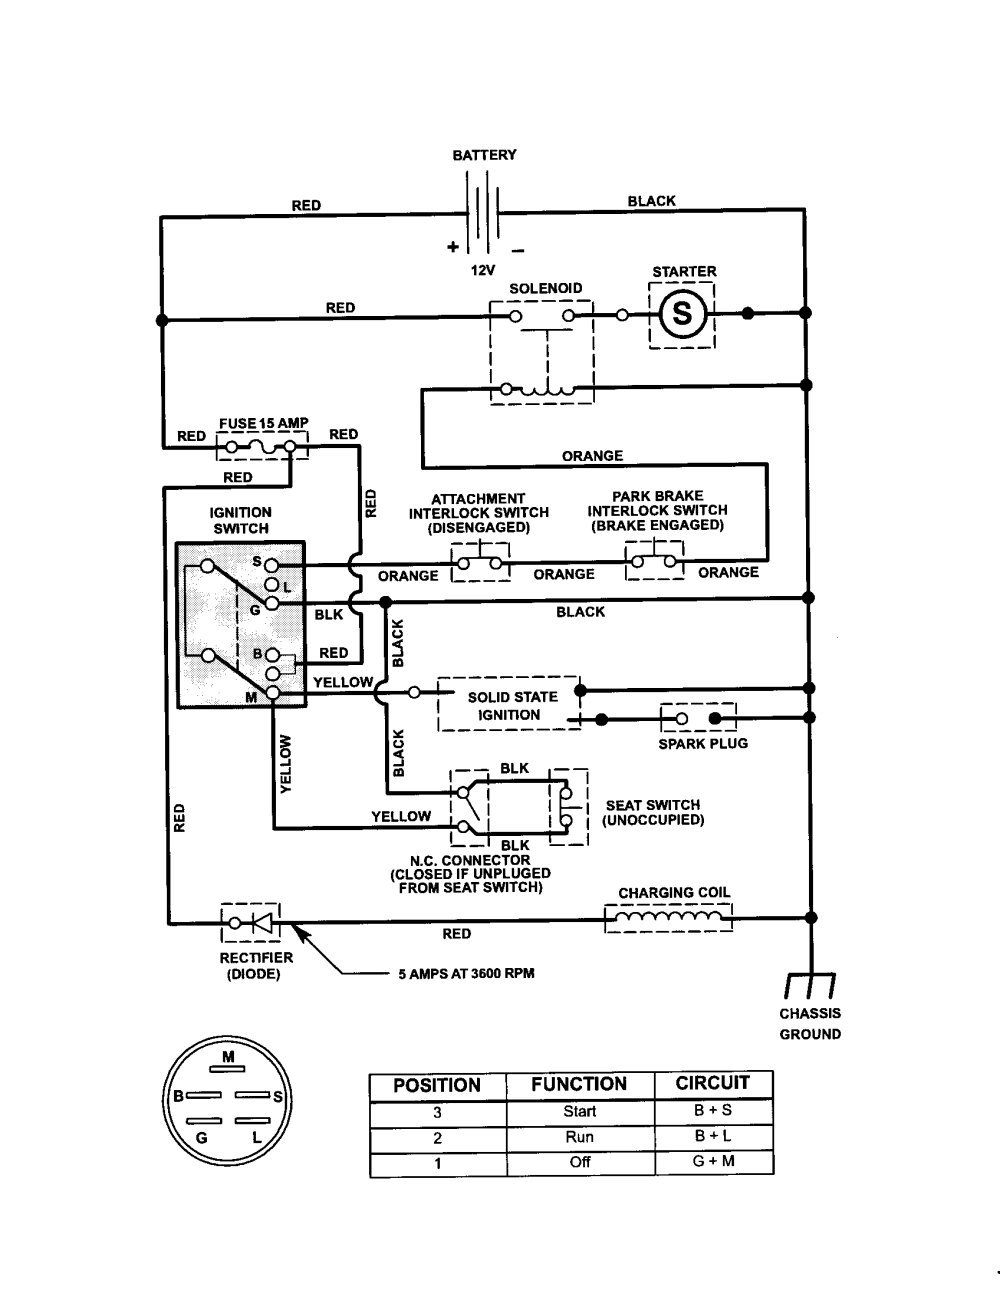 medium resolution of craftsman 536270212 electrical schematic diagram